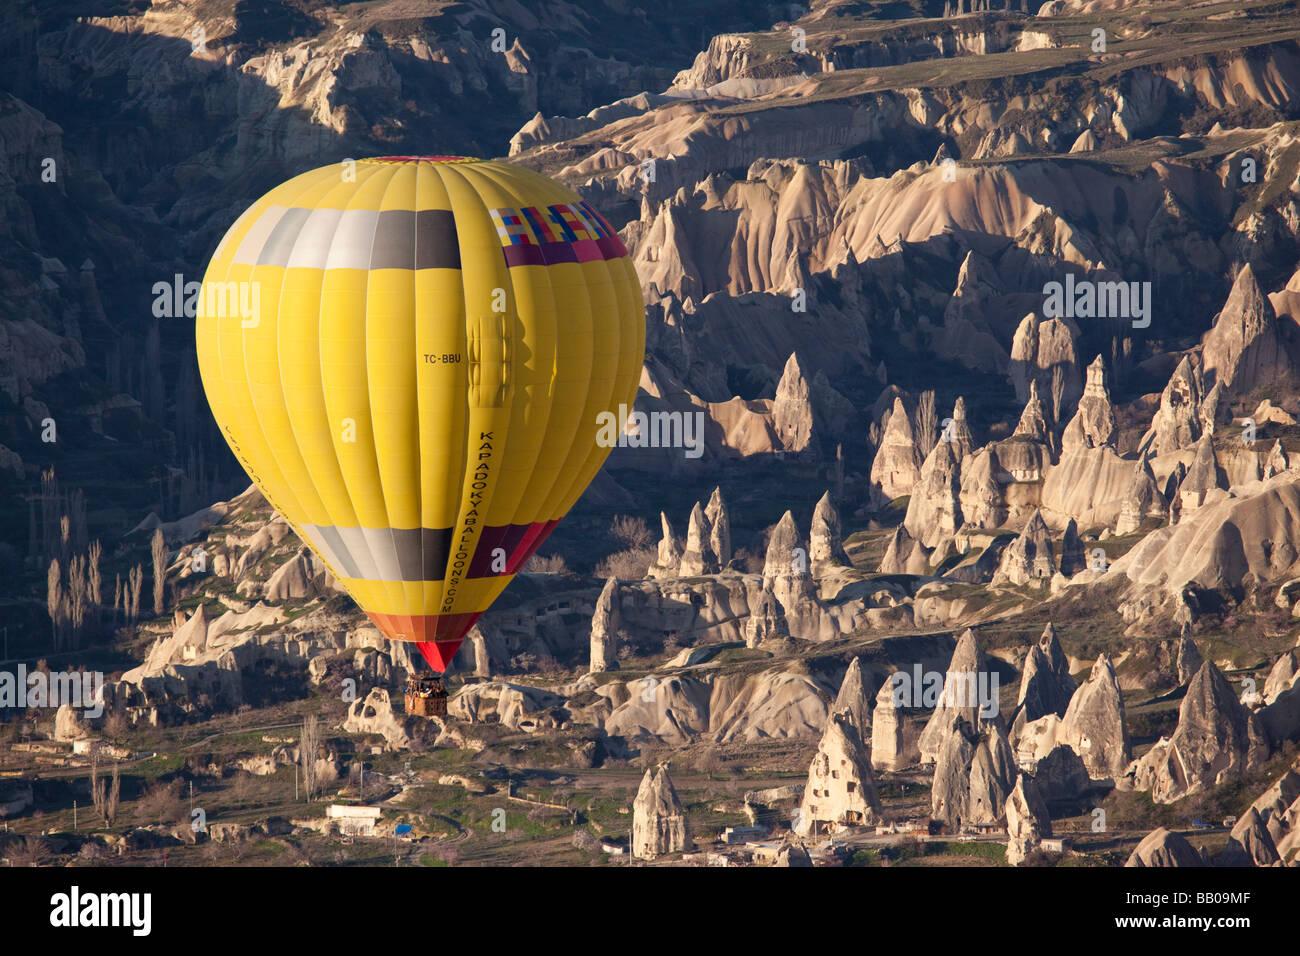 Hot air balloon over the rugged terrain of Cappadocia Turkey - Stock Image